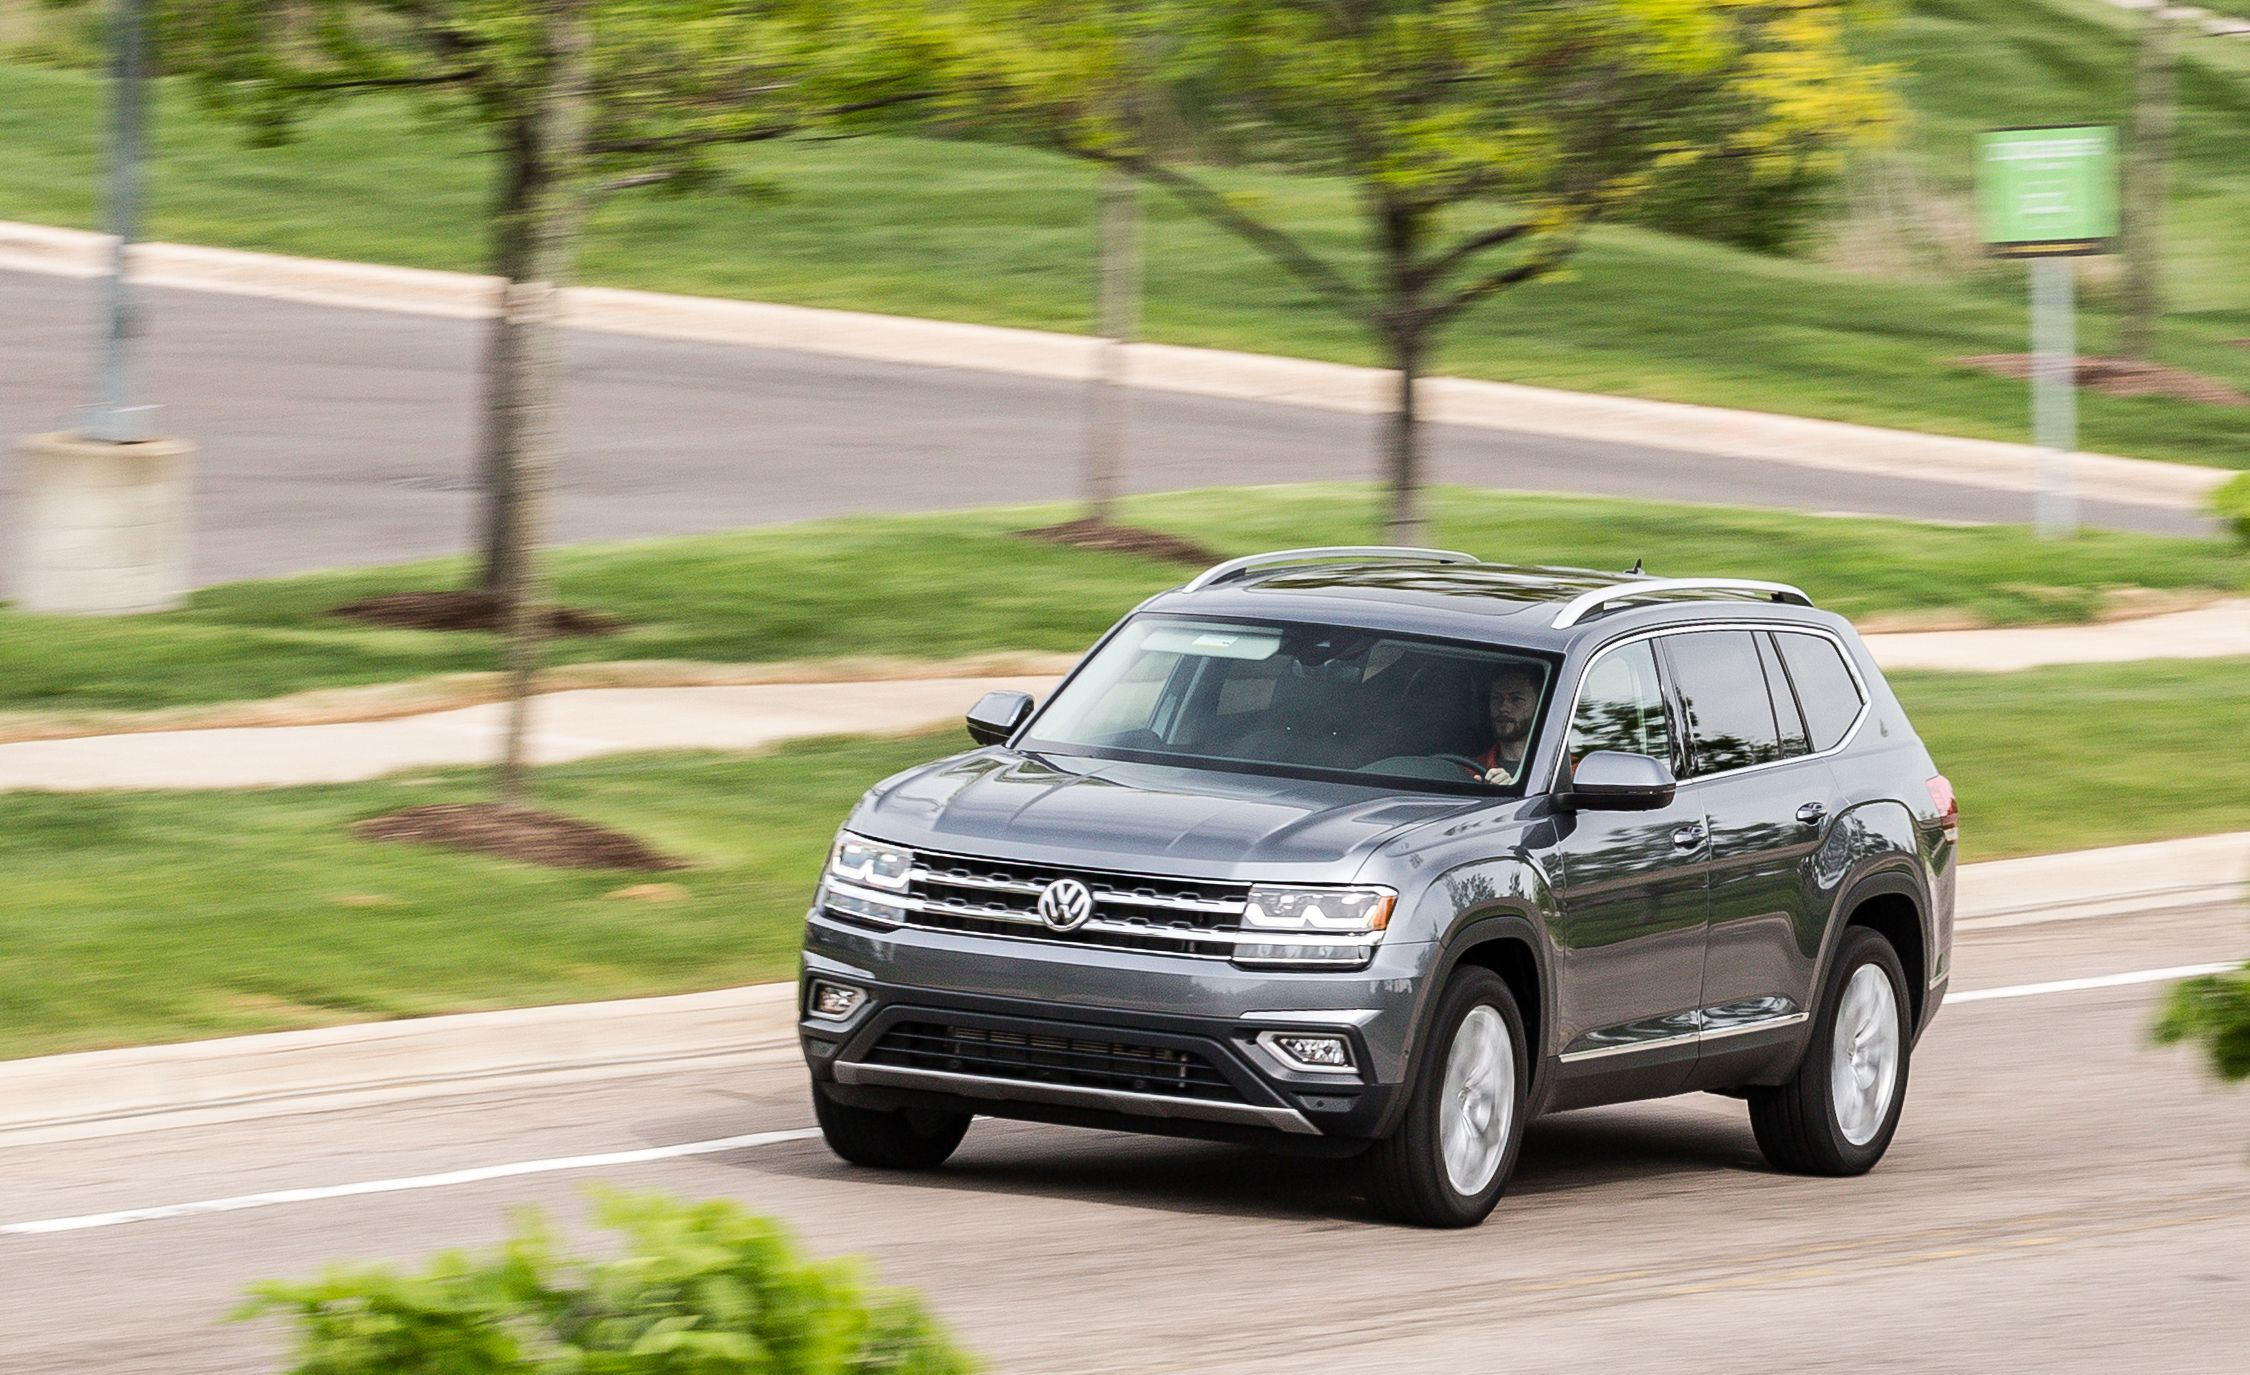 2018 Volkswagen Atlas First Drive Review